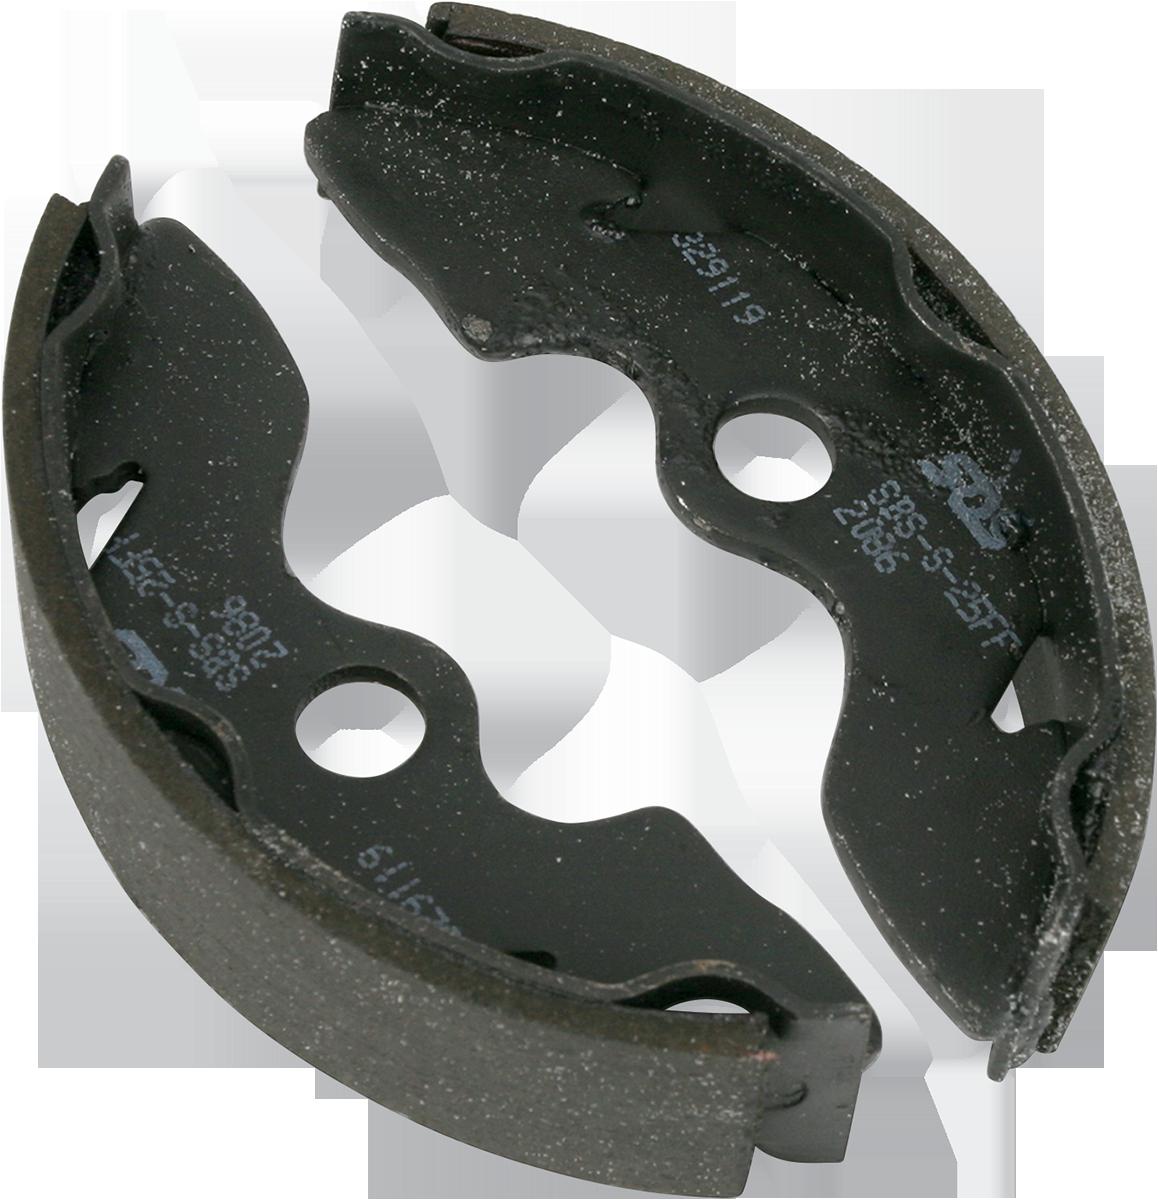 Transparent Blue Hose /& Stainless Banjos Pro Braking PBF8175-TBL-SIL Front Braided Brake Line